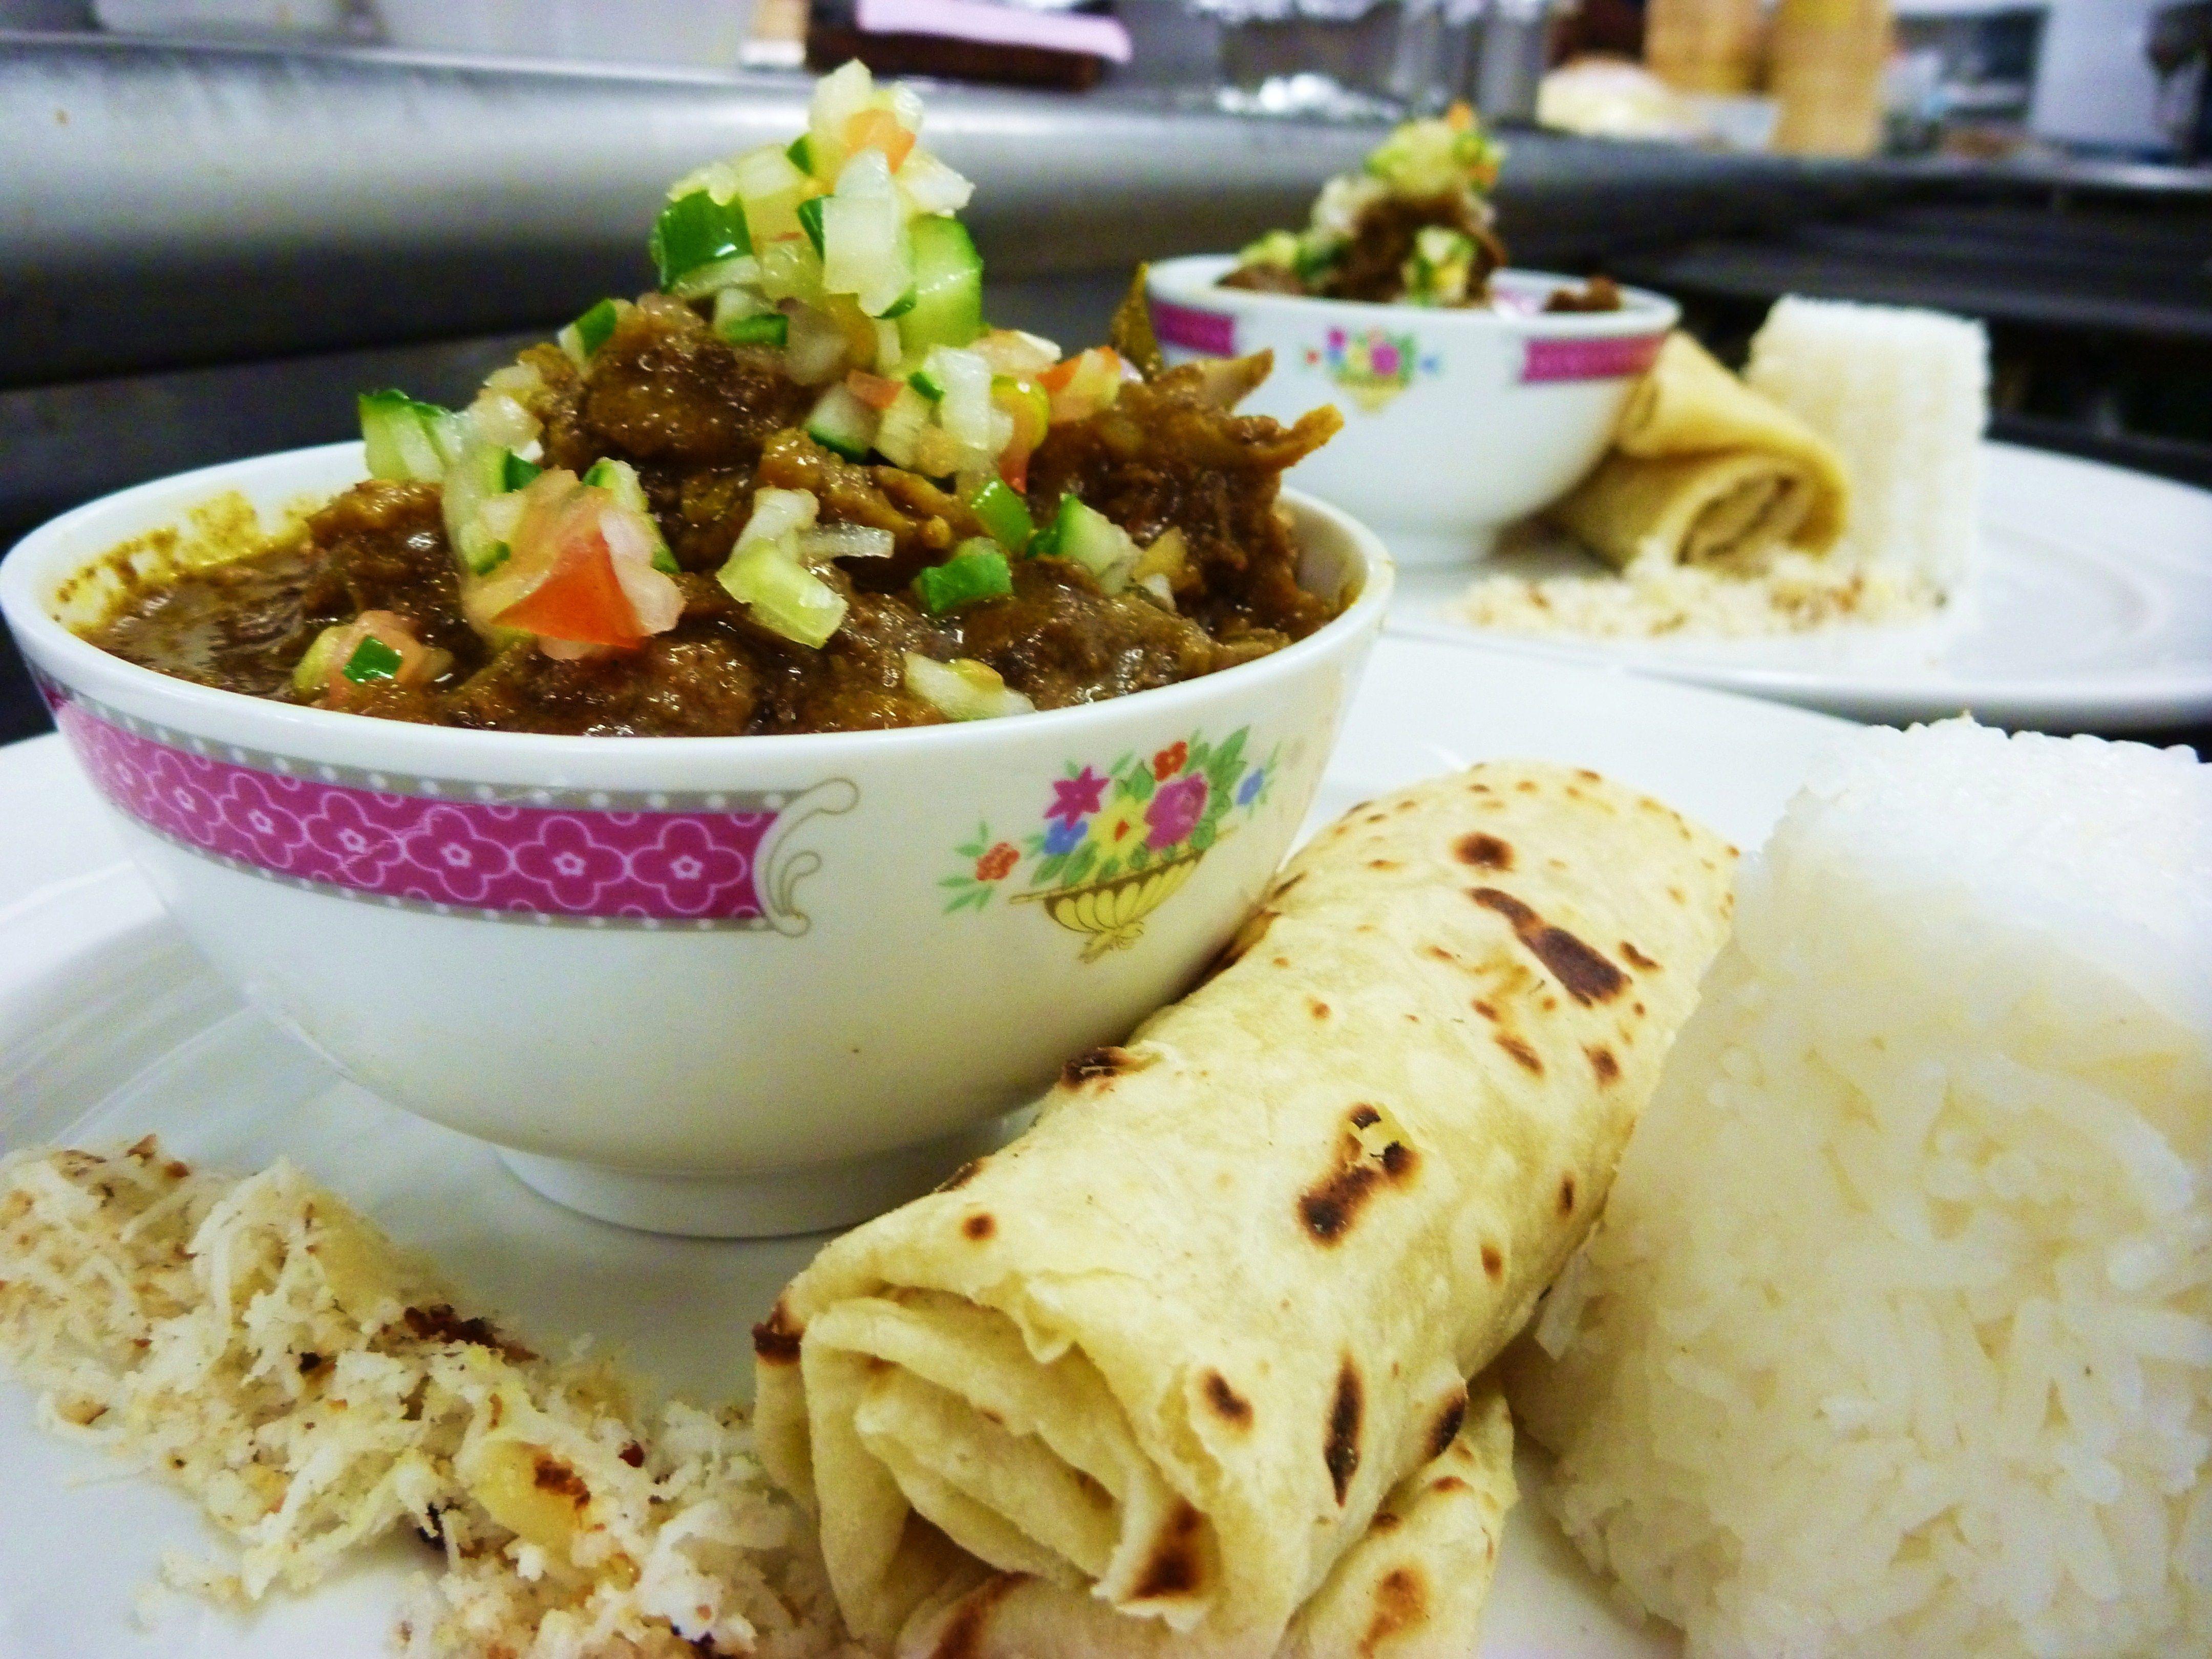 Island Of People Fiji Food | Peking Duck Curry | Fijian Food ...